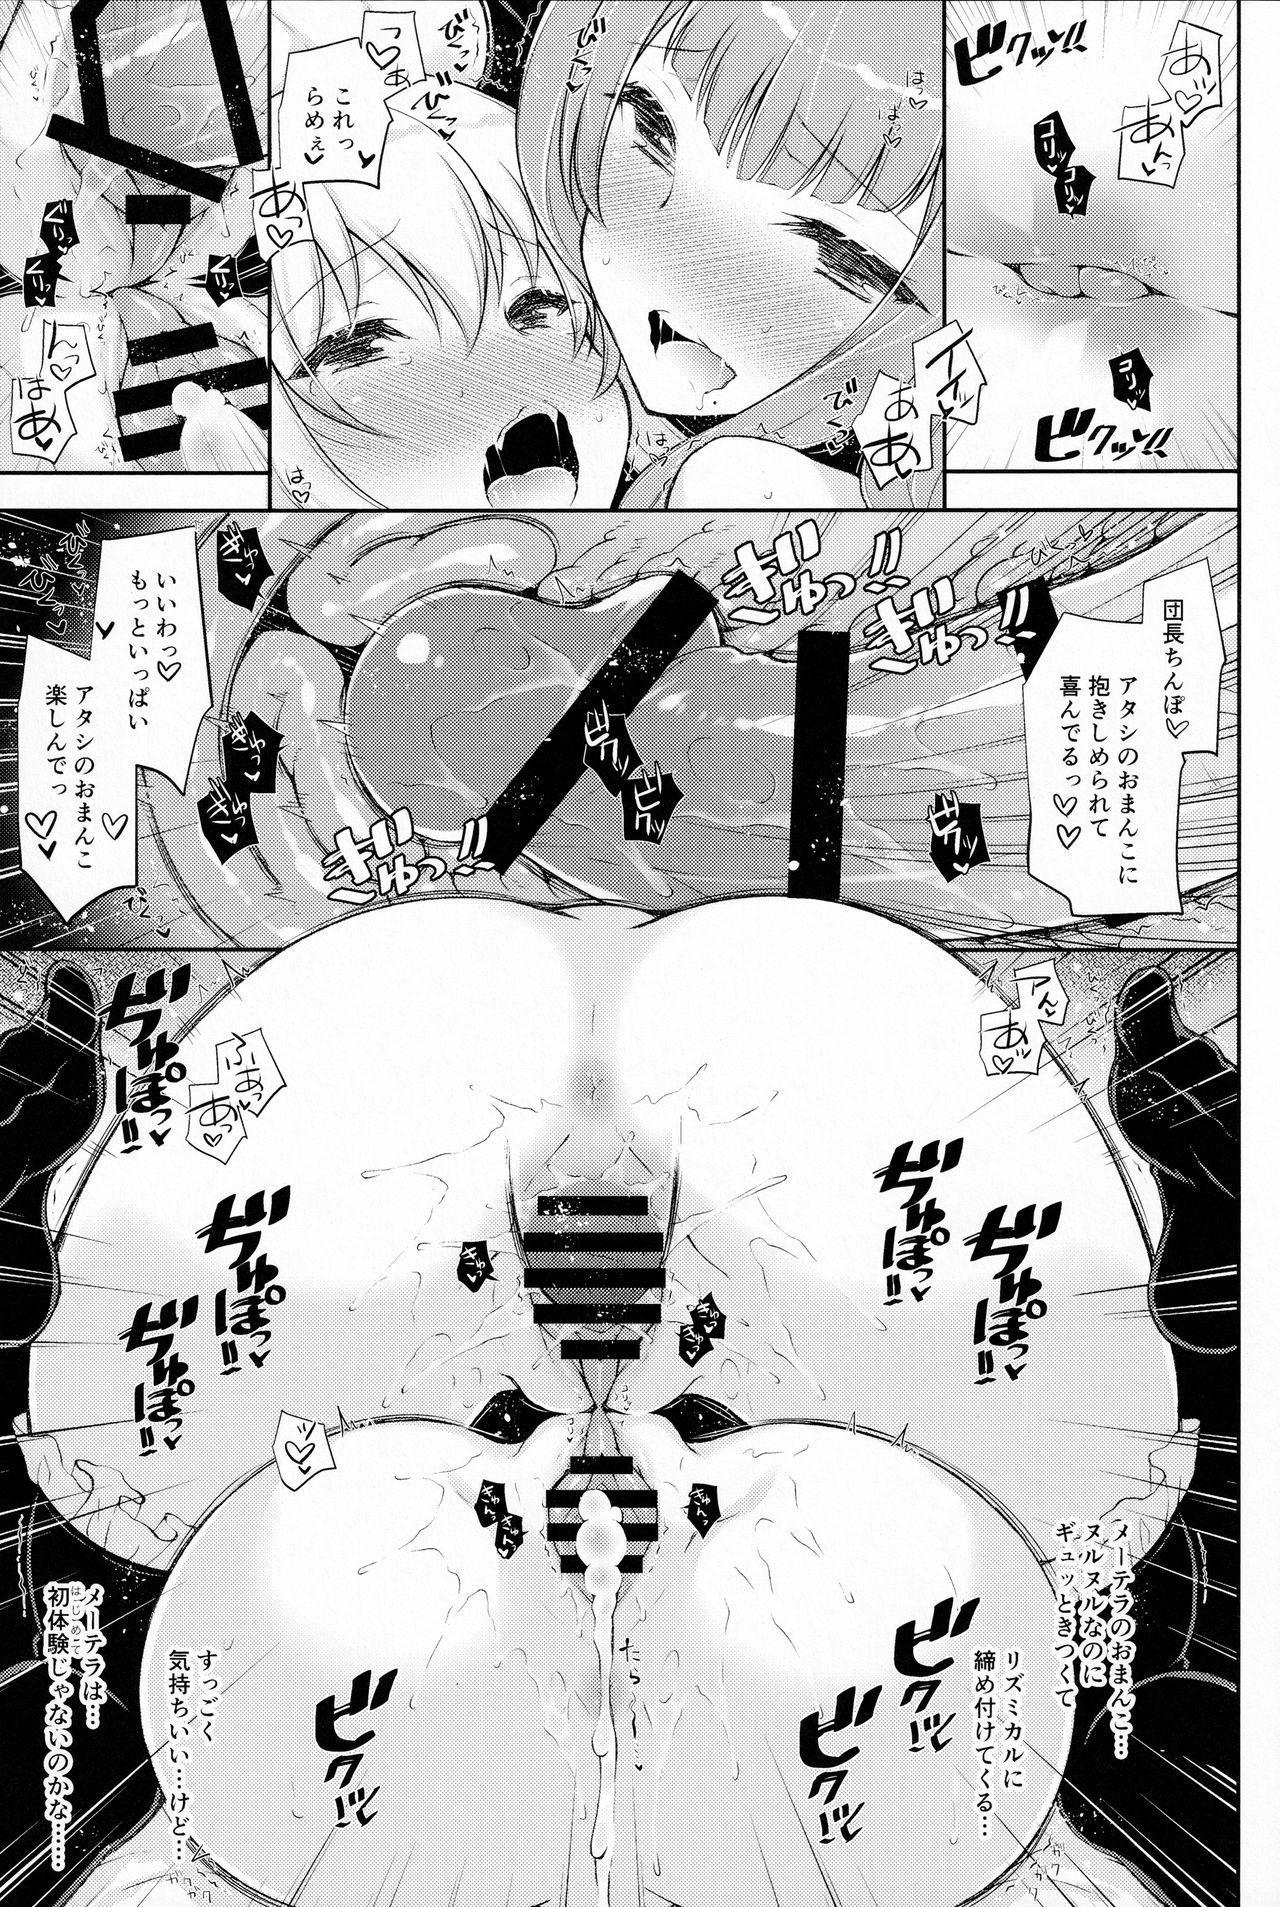 (COMIC1☆17) [Shigunyan (Shigunyan)] Onee-chan-tachi ni Amaete ne 2 (Granblue Fantasy) 15